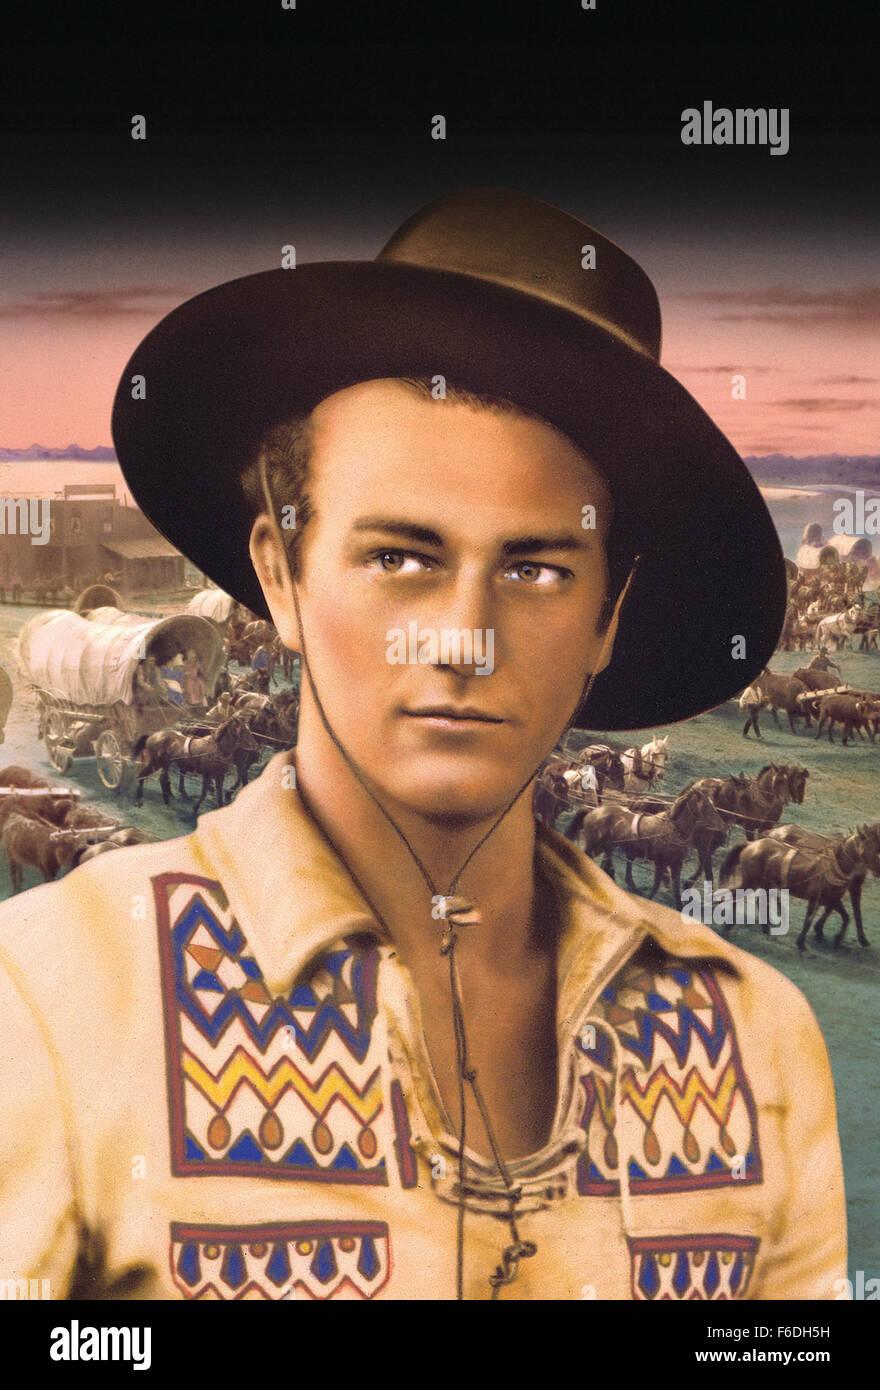 Oct 24, 1930 - Original Film Title: The Big Trail. PICTURED: JOHN WAYNE. - Stock Image